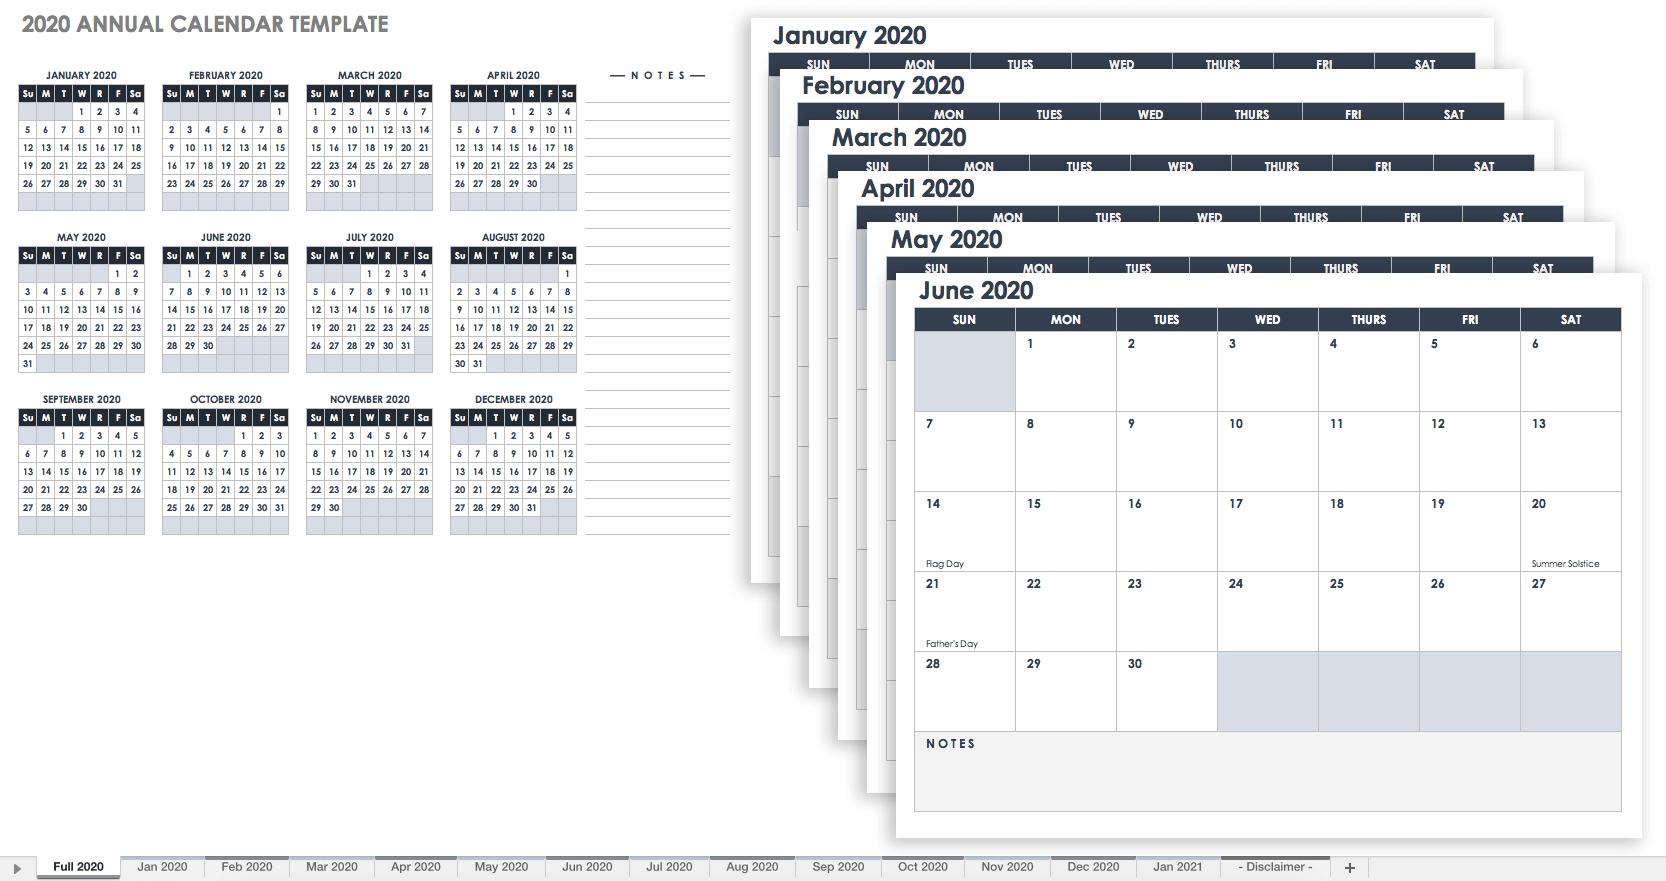 15 Free Monthly Calendar Templates | Smartsheet regarding Monthly Calendar Template A3 Landscape